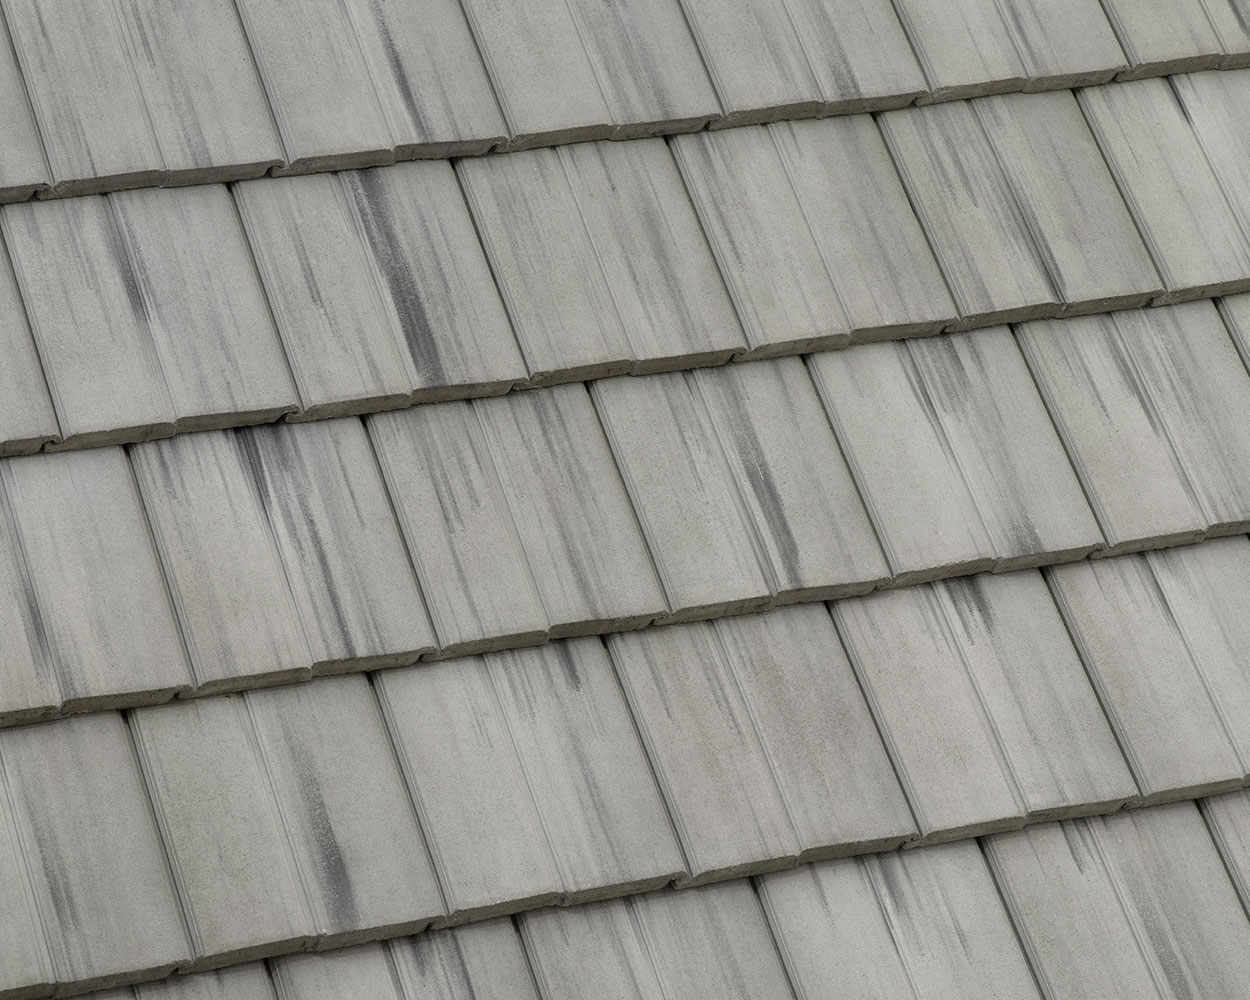 Flintridge gray tile roof color swatch